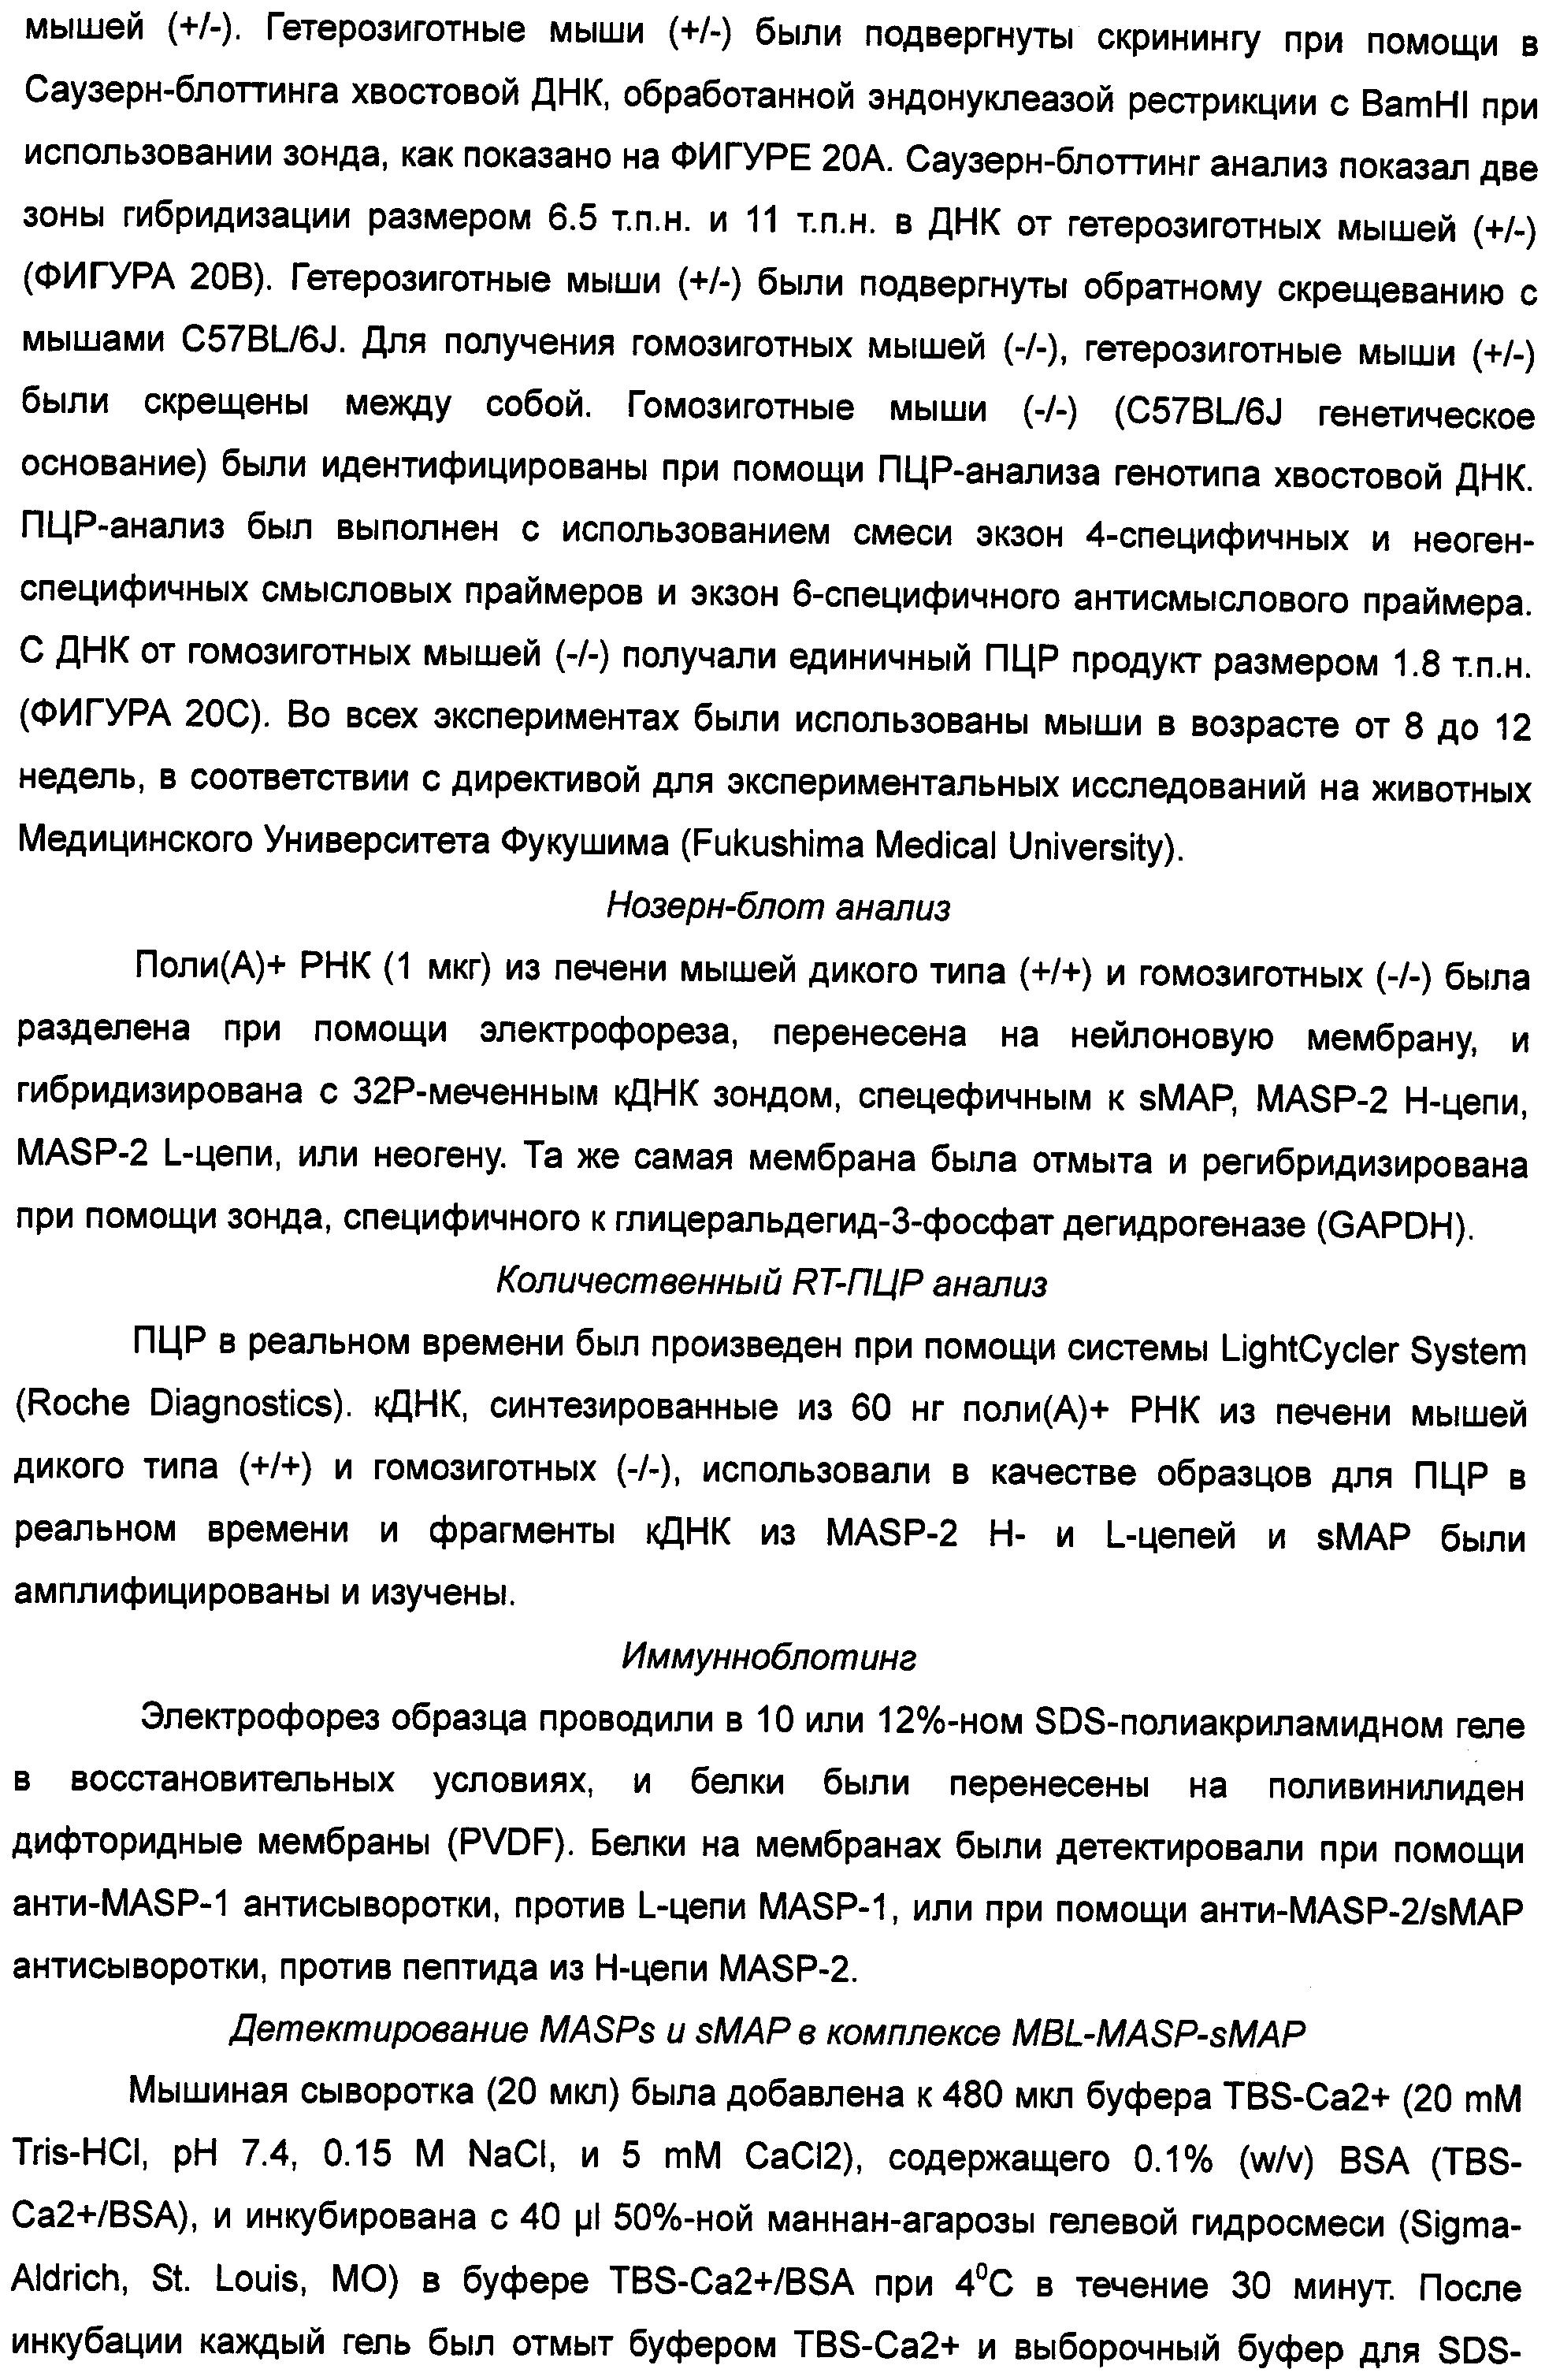 Figure 00000178